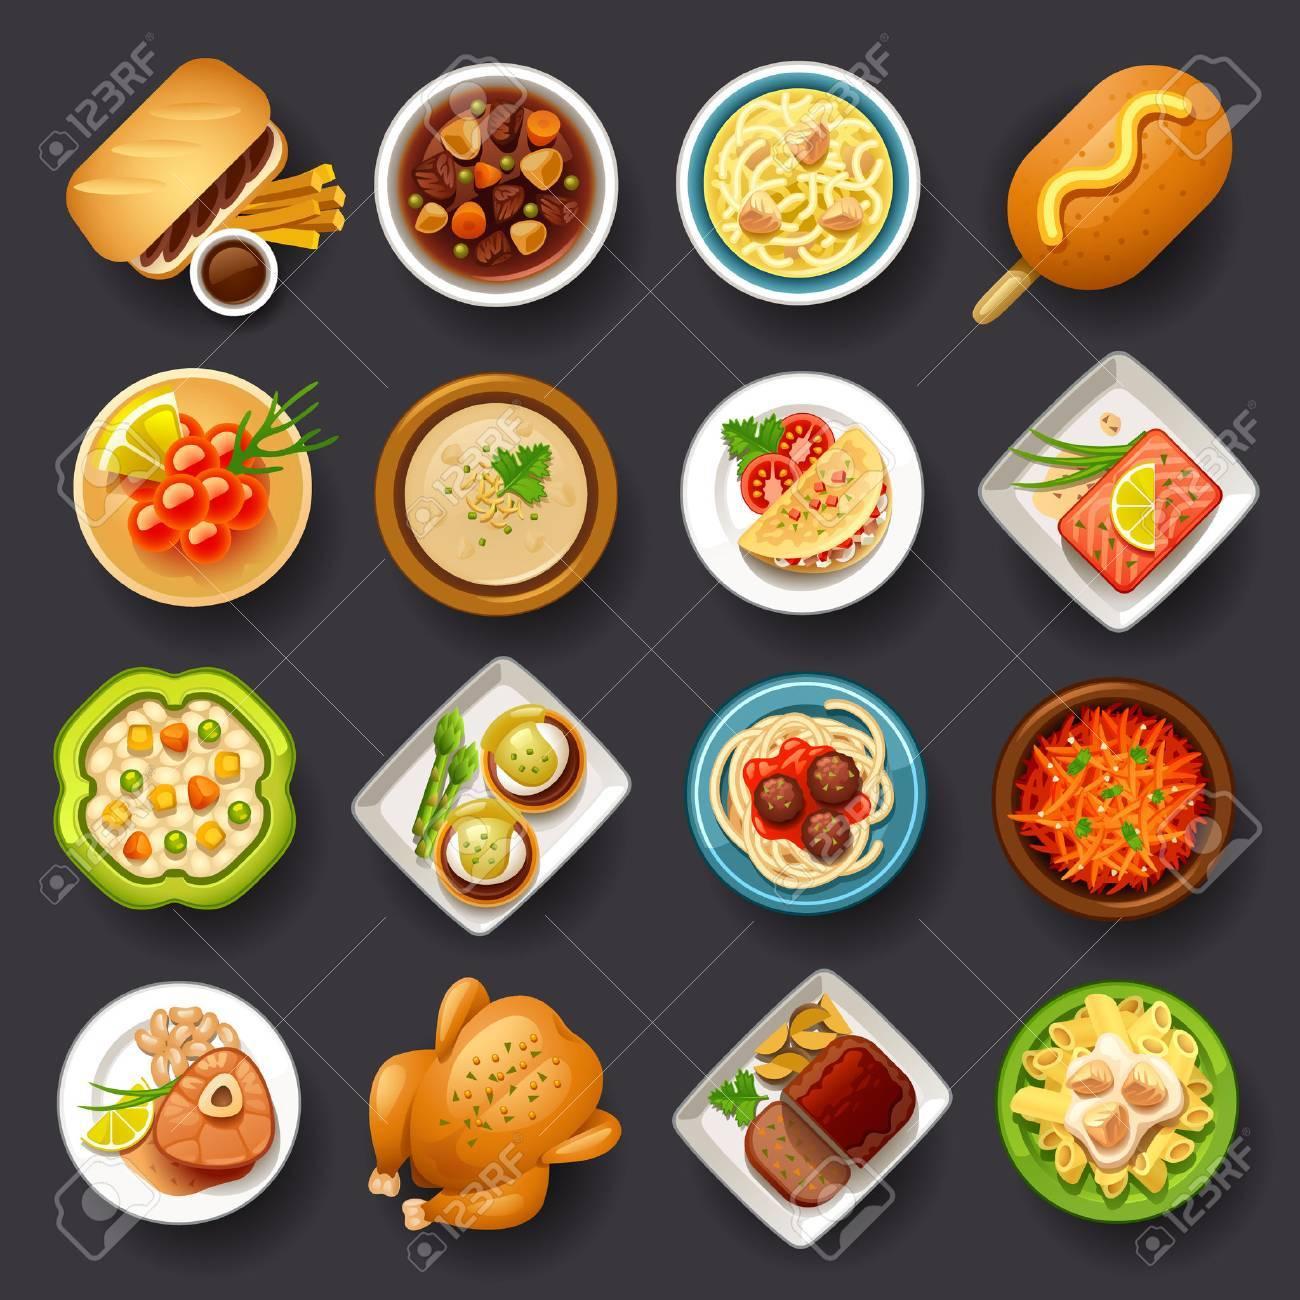 dishes icon set-3 - 36850928